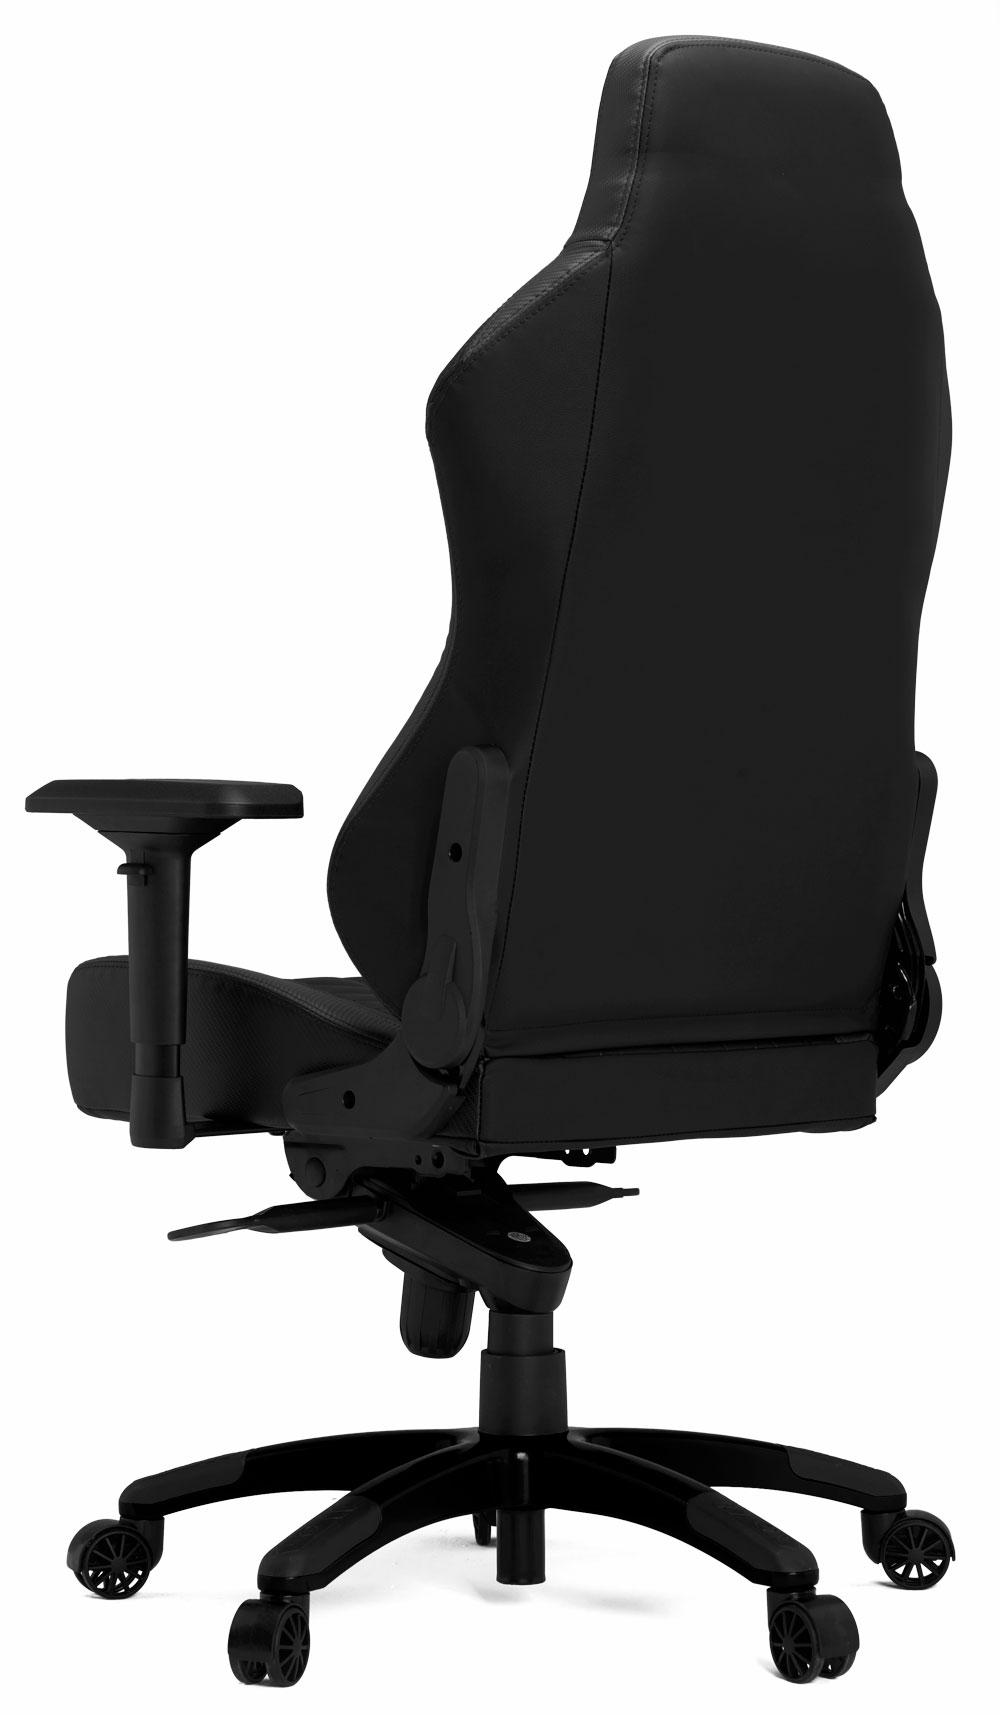 HHGears XL-800 Gaming Chair - Black/Black